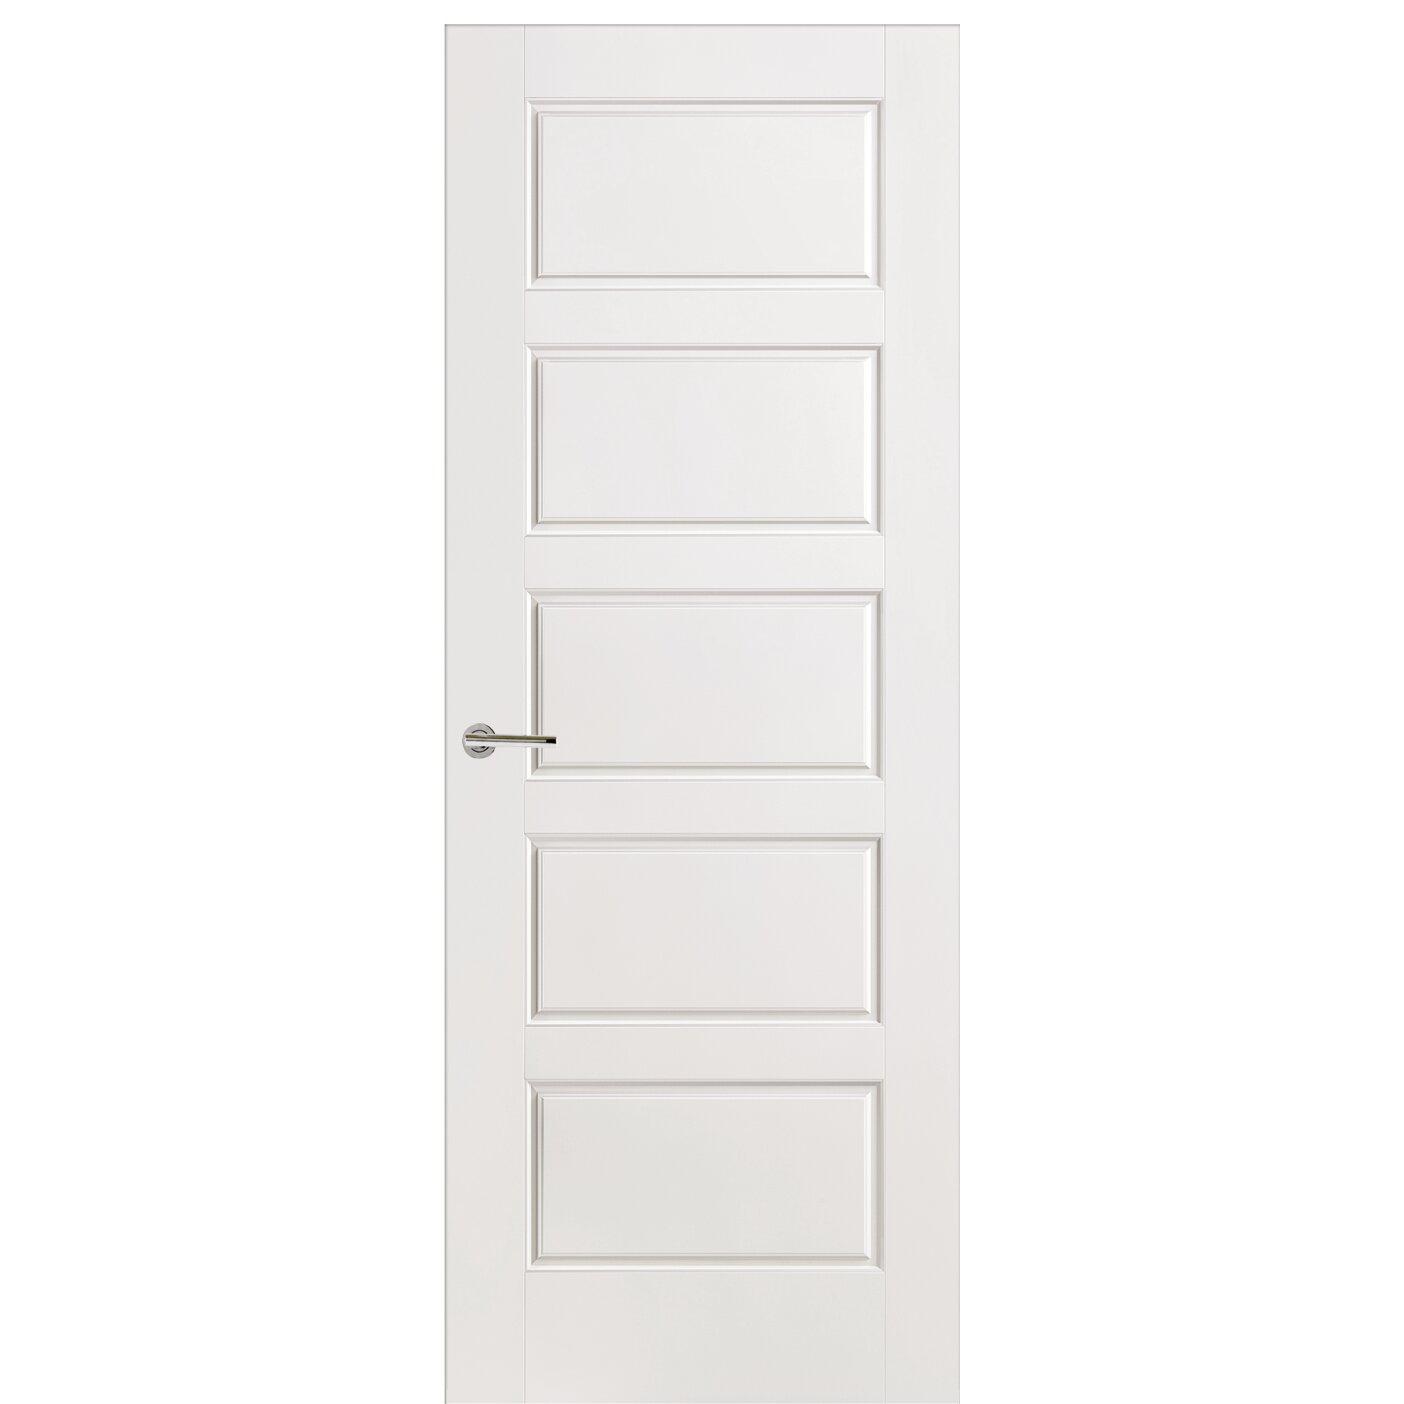 premdor 5 panel white smooth internal door reviews. Black Bedroom Furniture Sets. Home Design Ideas